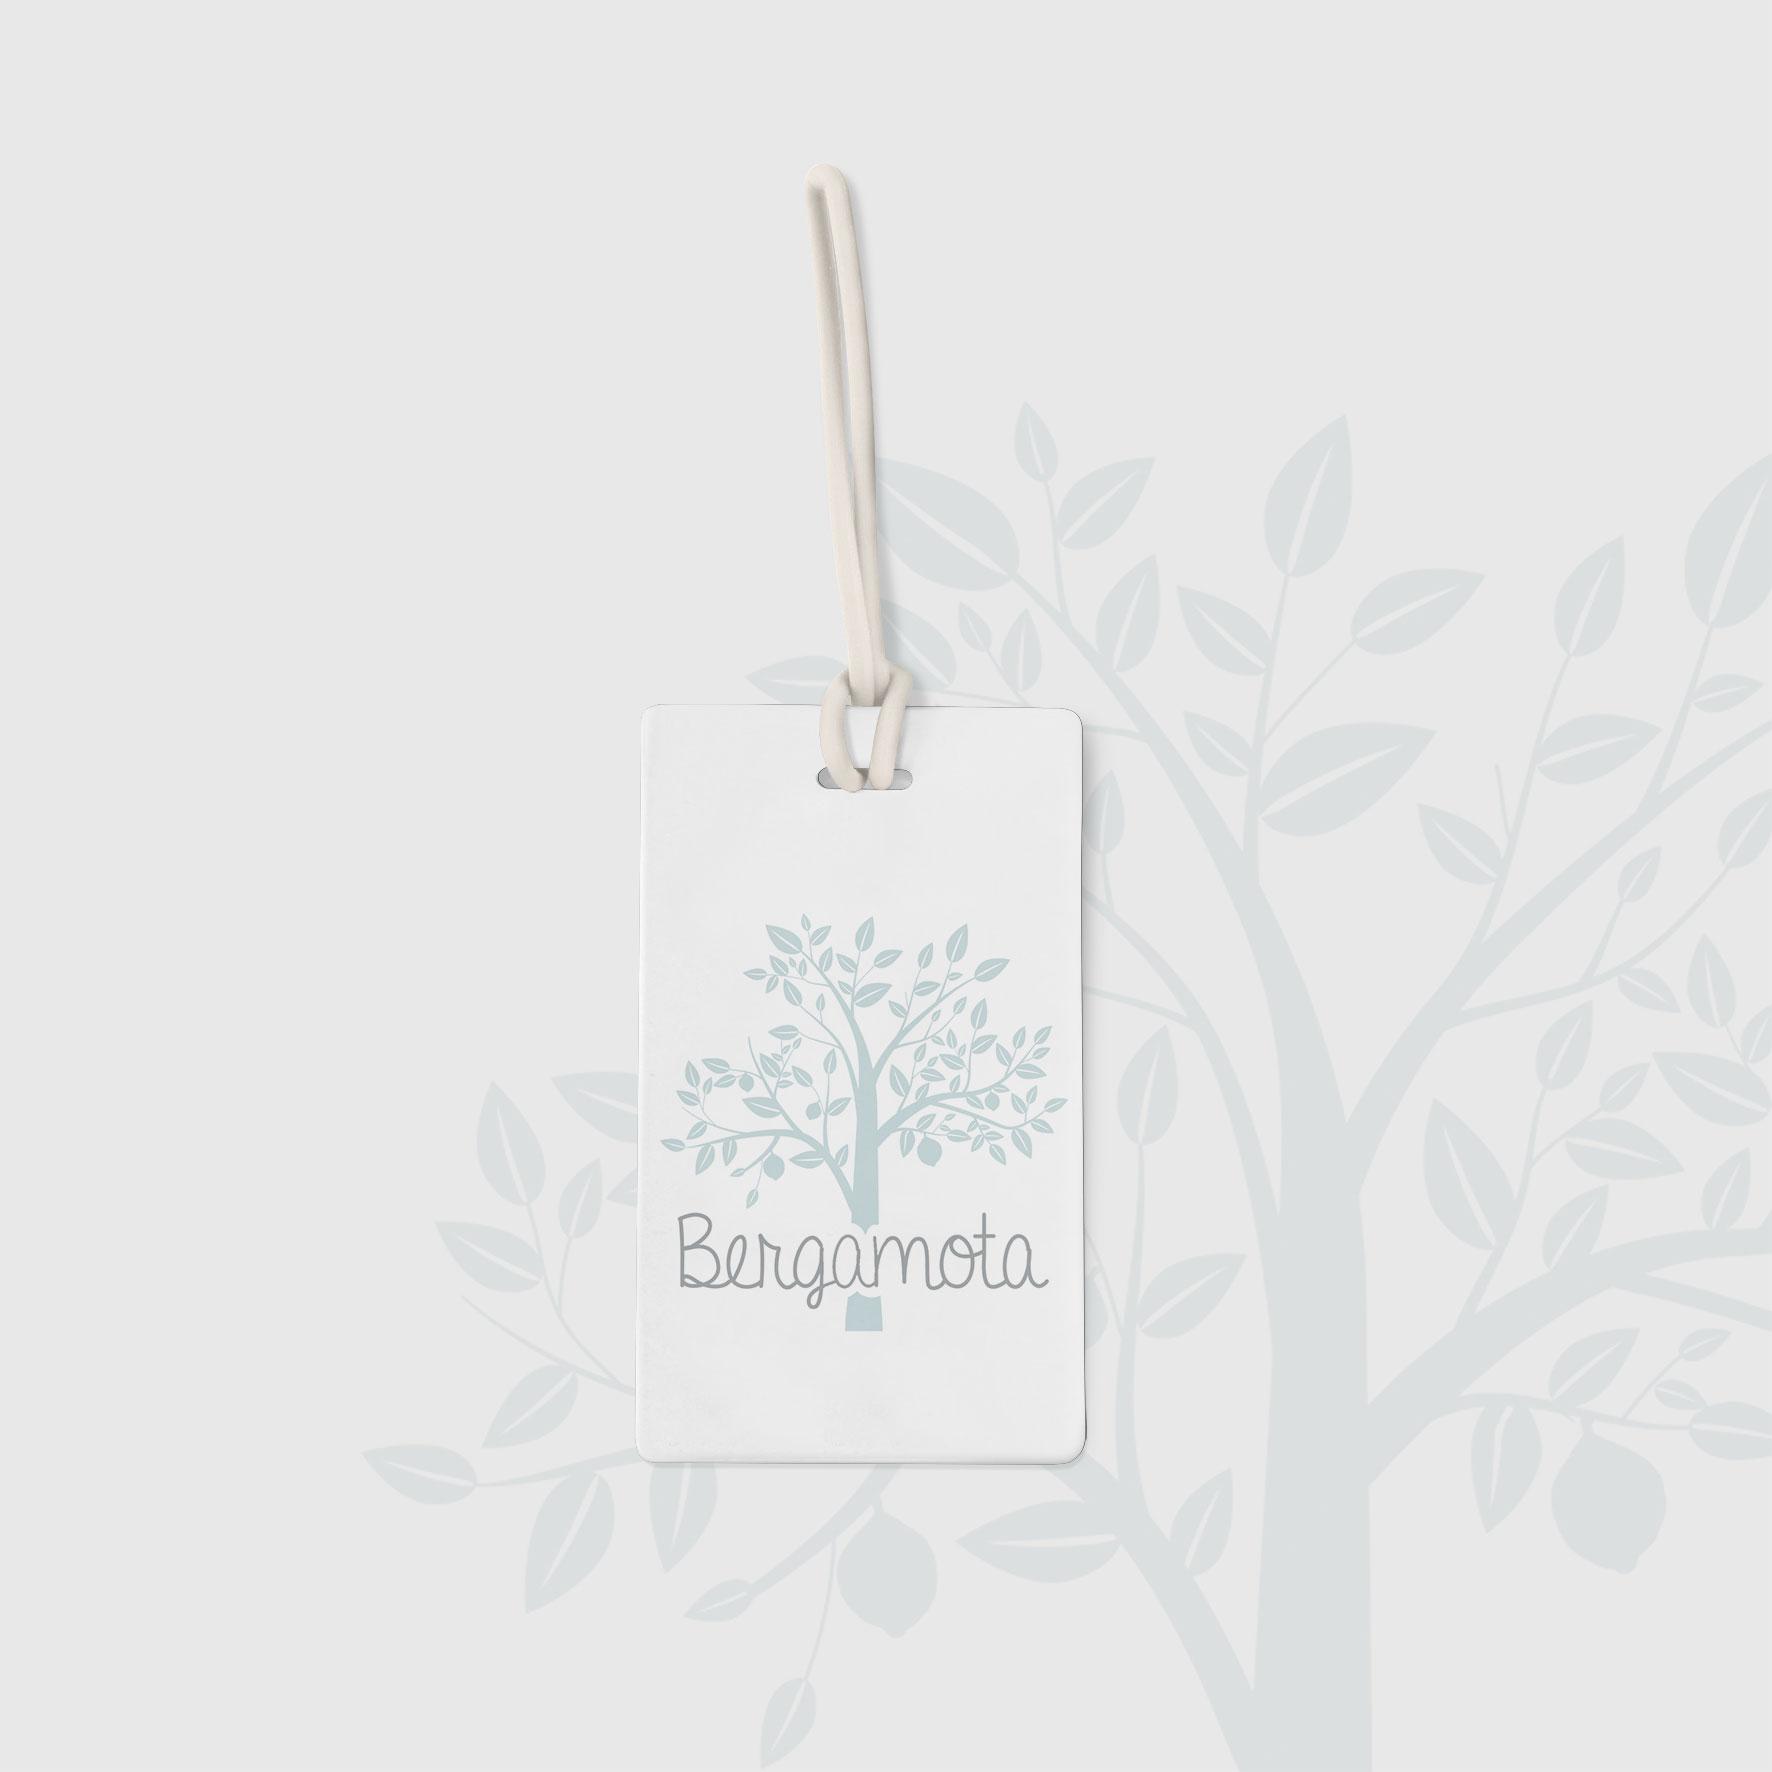 Etiqueta cartón logotipo ropa Bergamota